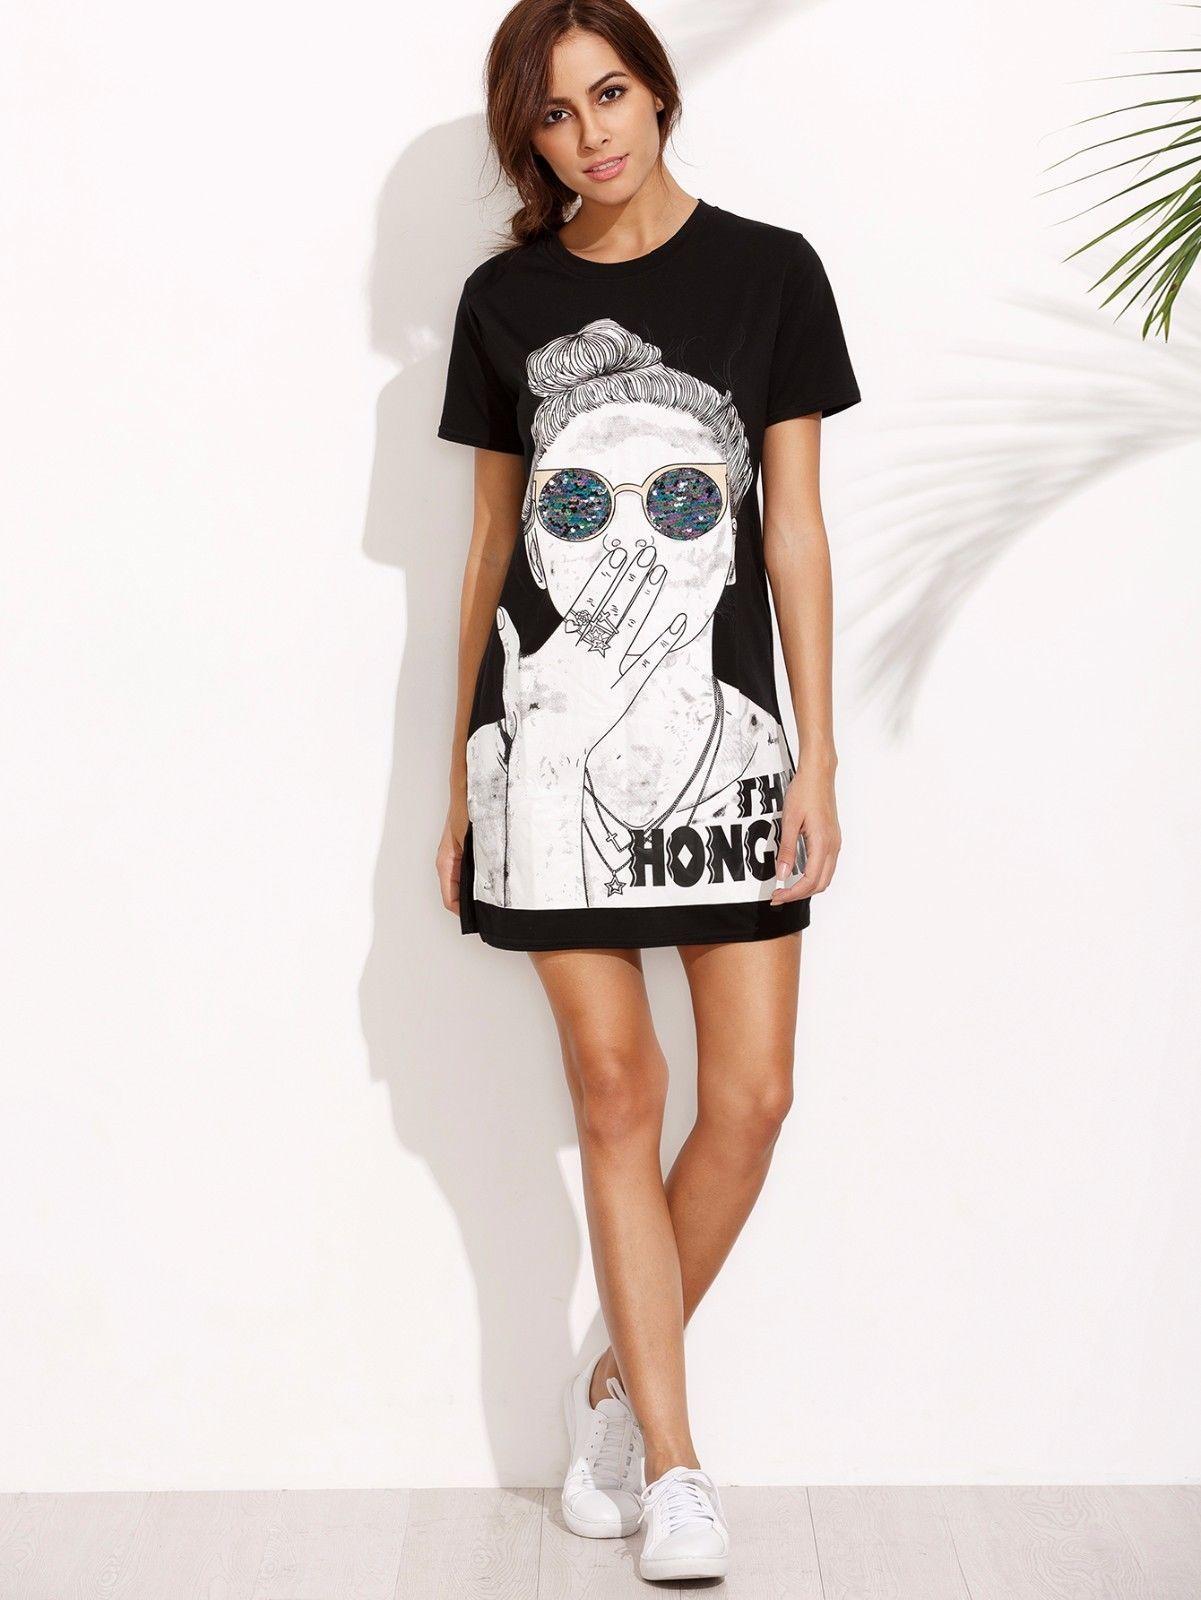 Ladies Black Print Split Side T-Shirt Short Sleeve Mini Dress Casual Tunic Top | eBay